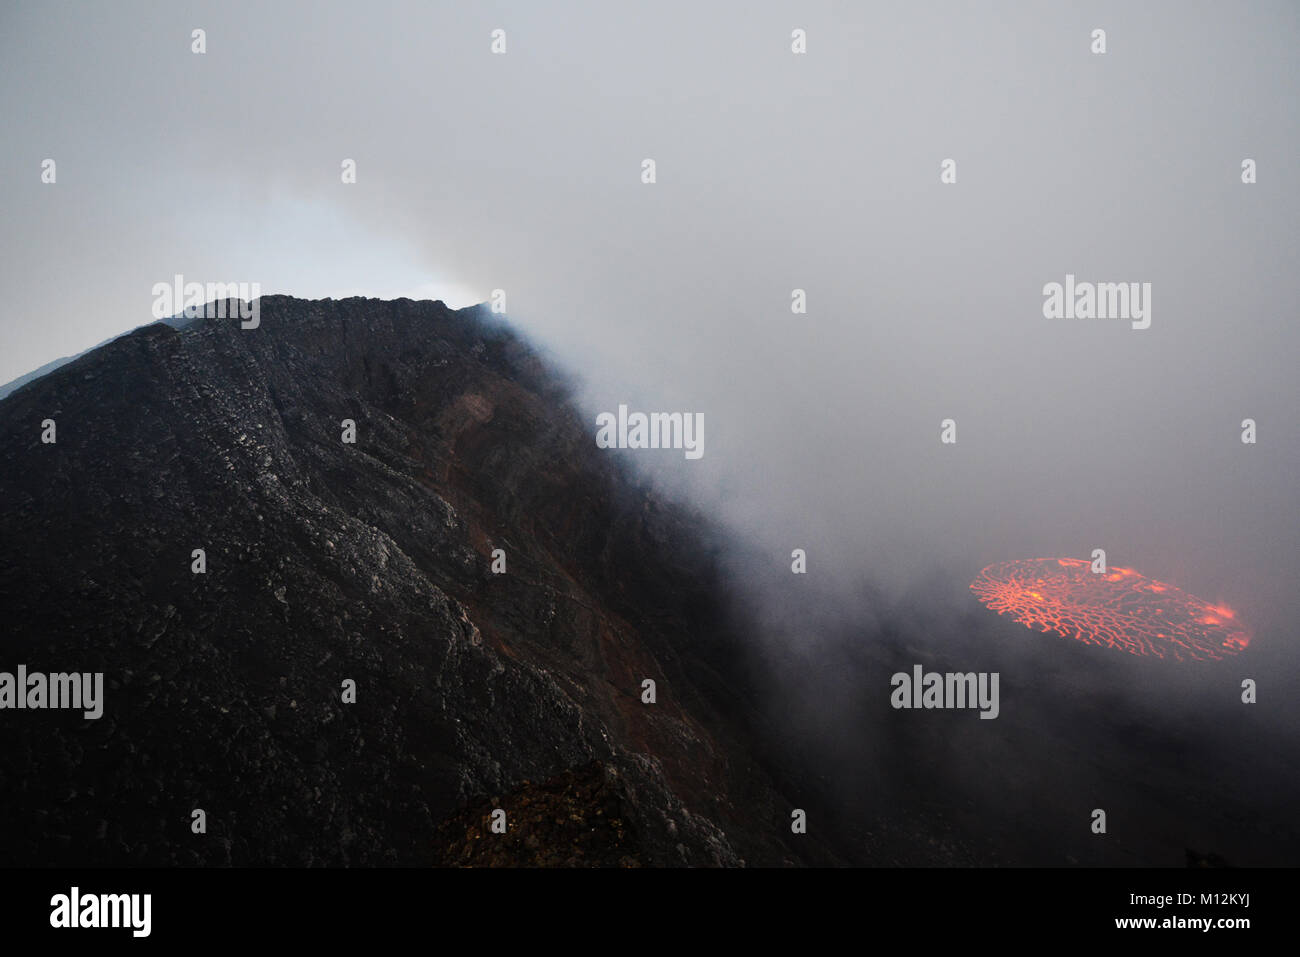 Nyiragongo volcano in the Virunga mountains, D.R.C - Stock Image